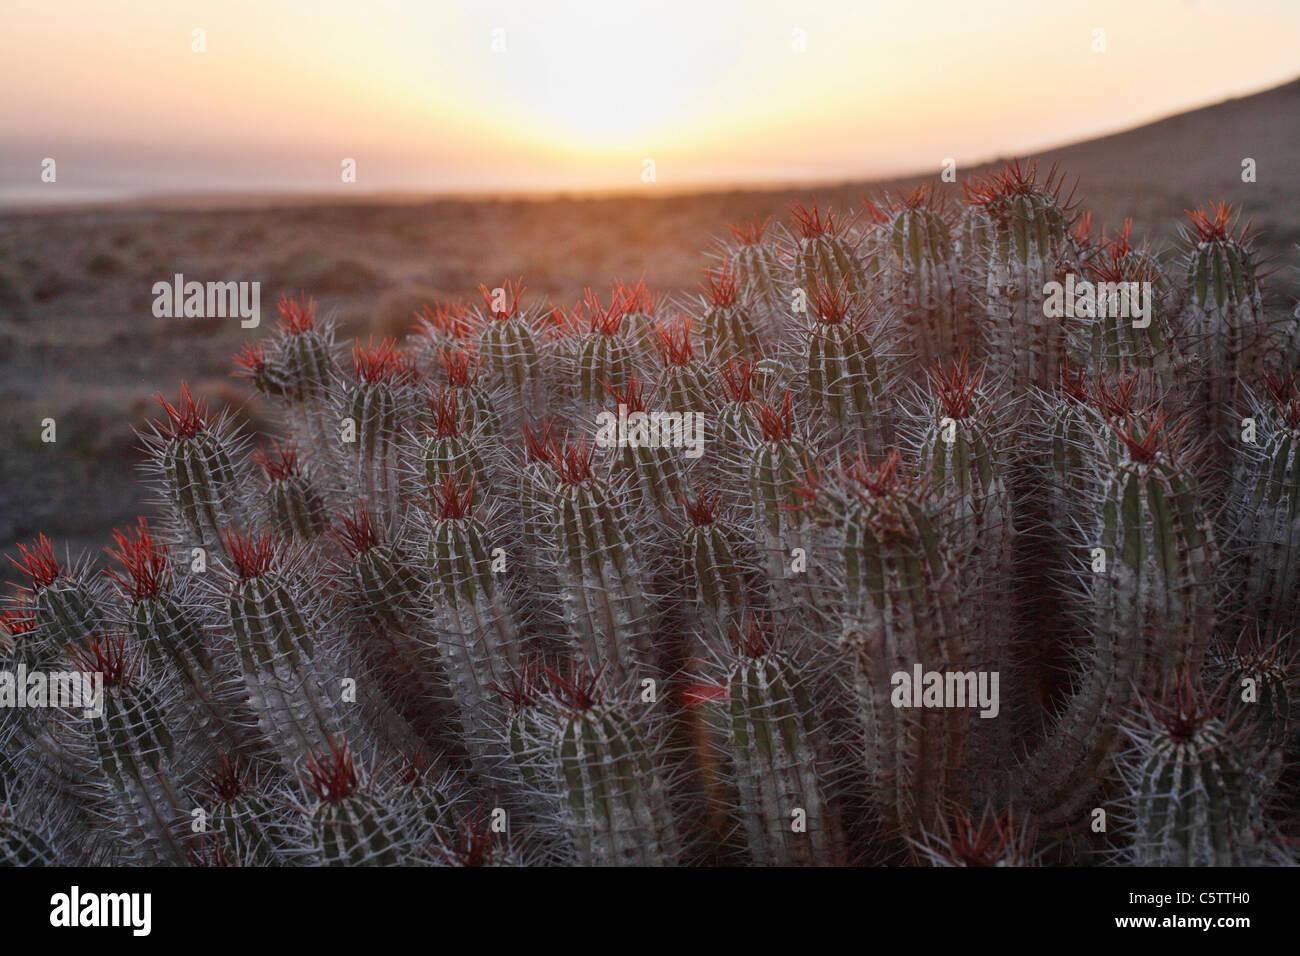 Spain, Canary Islands, Fuerteventura, Endemic plant on jandia - Stock Image